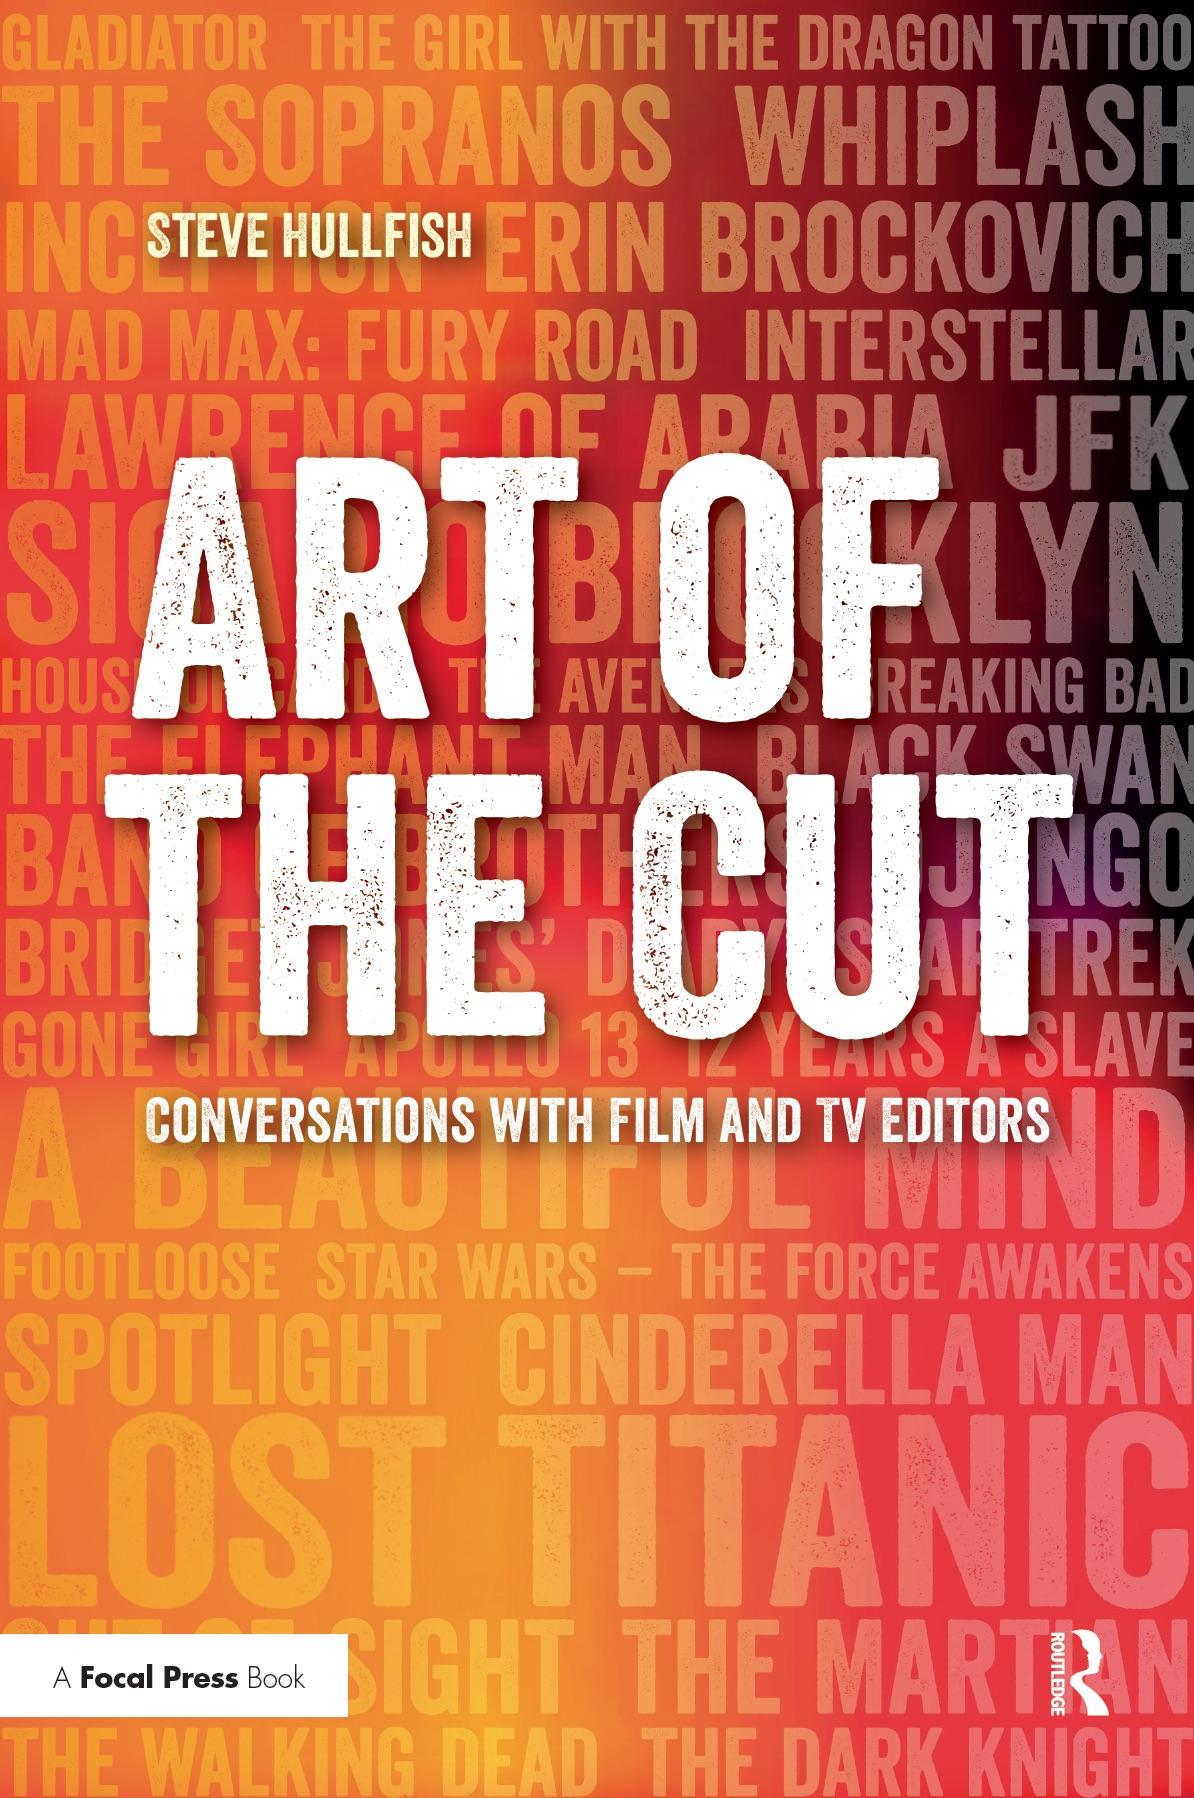 ART OF THE CUT with Dylan Tichenor, ACE on Phantom Thread 52